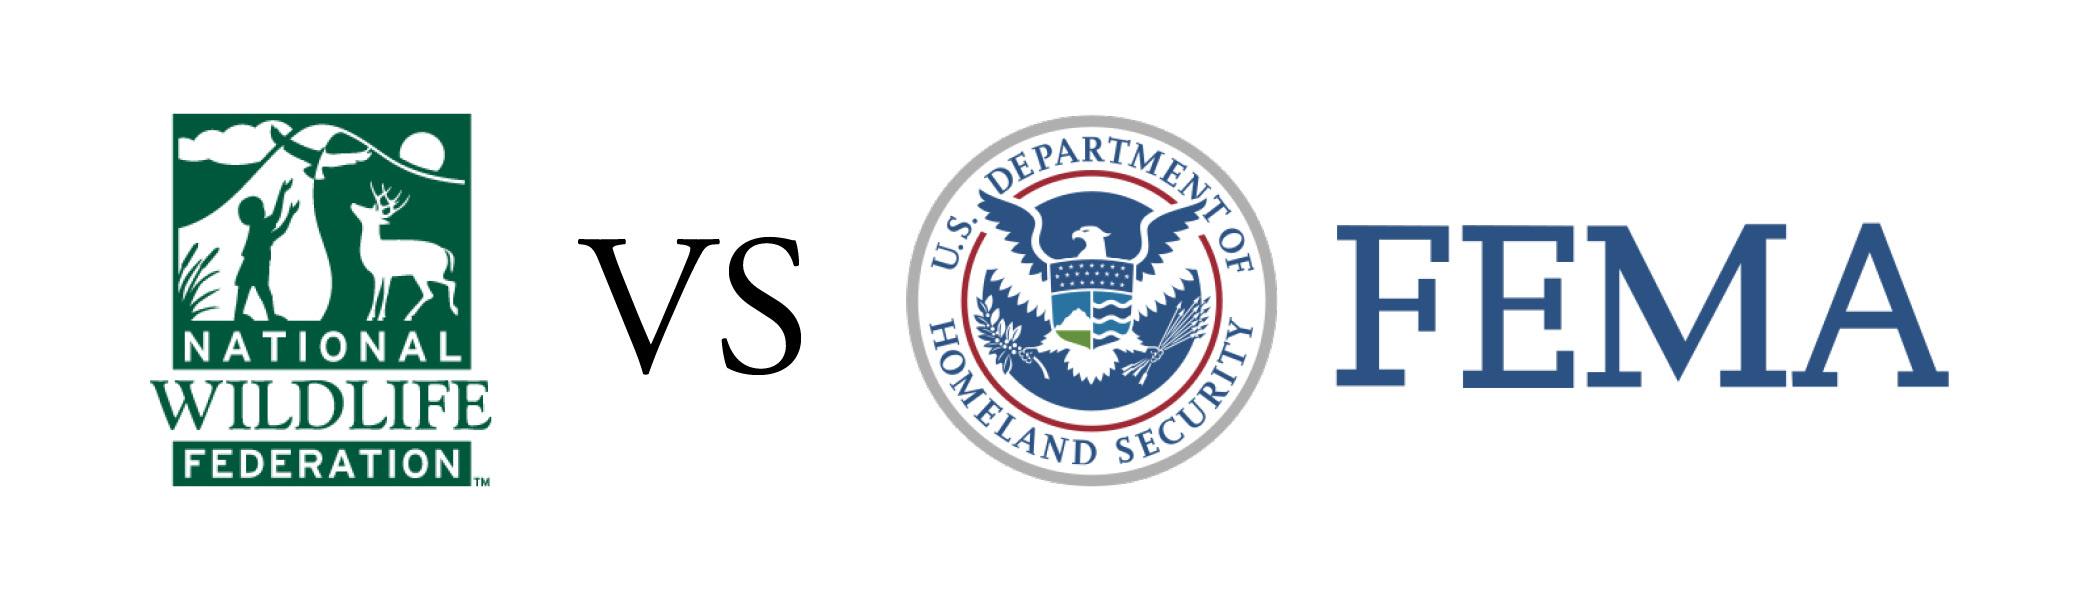 National Wildlife Federation vs FEMA